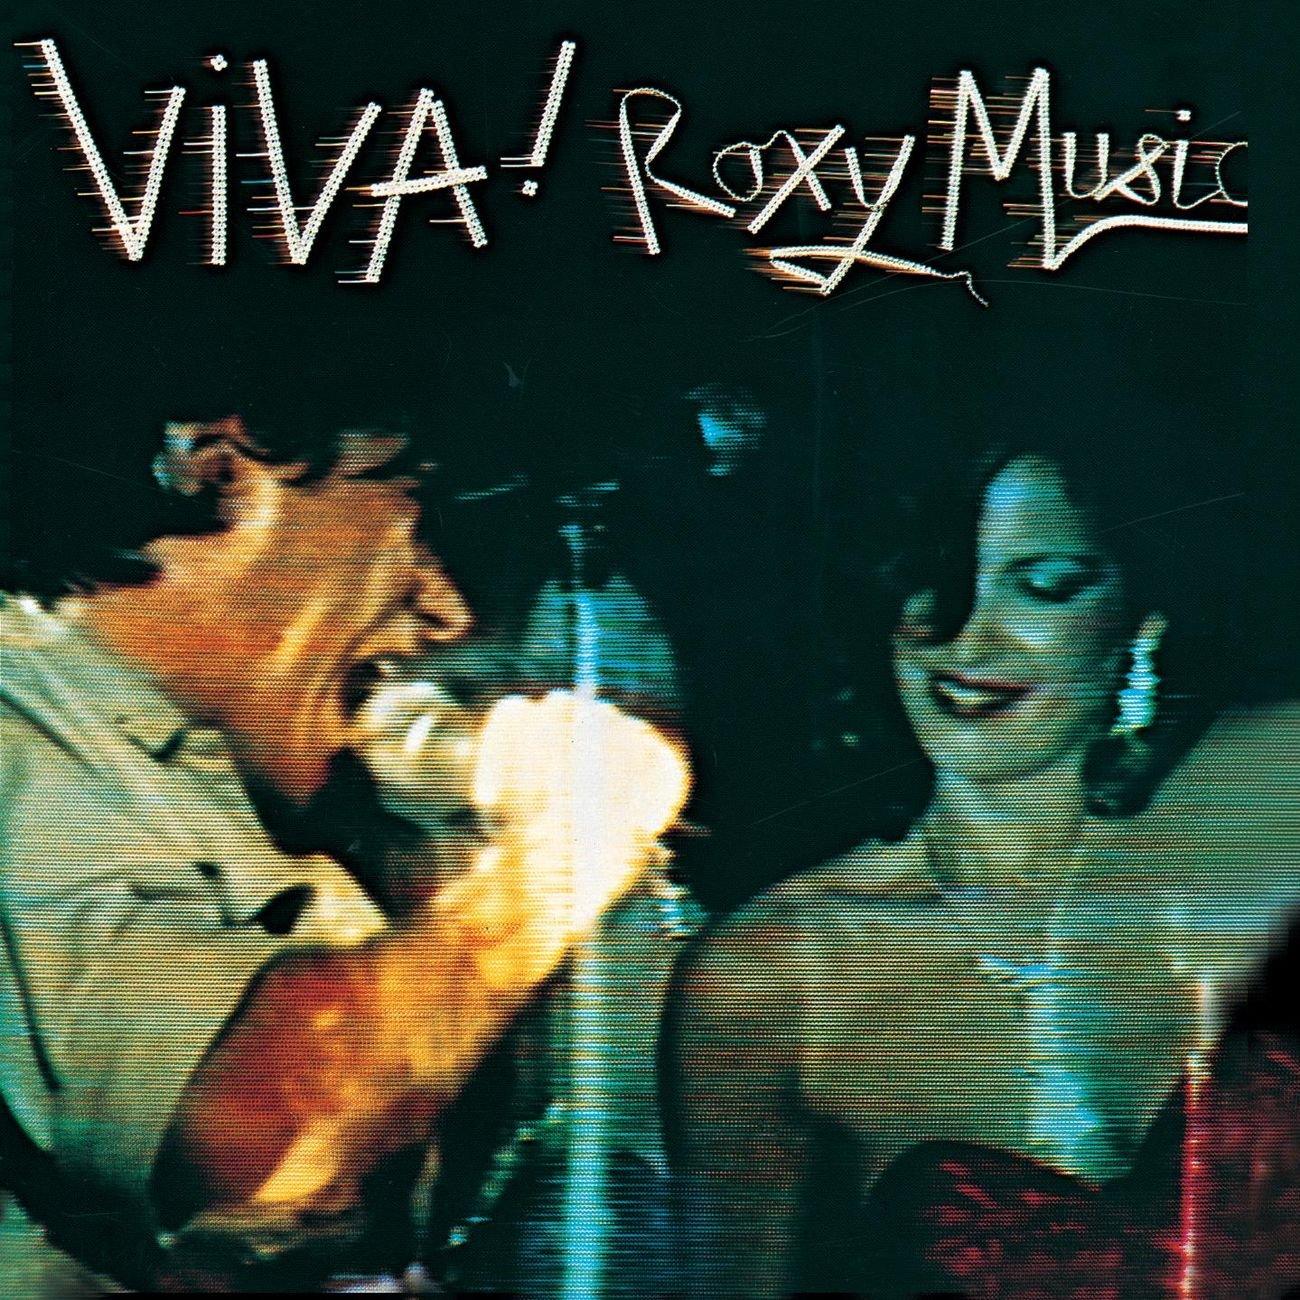 Viva by Virgin